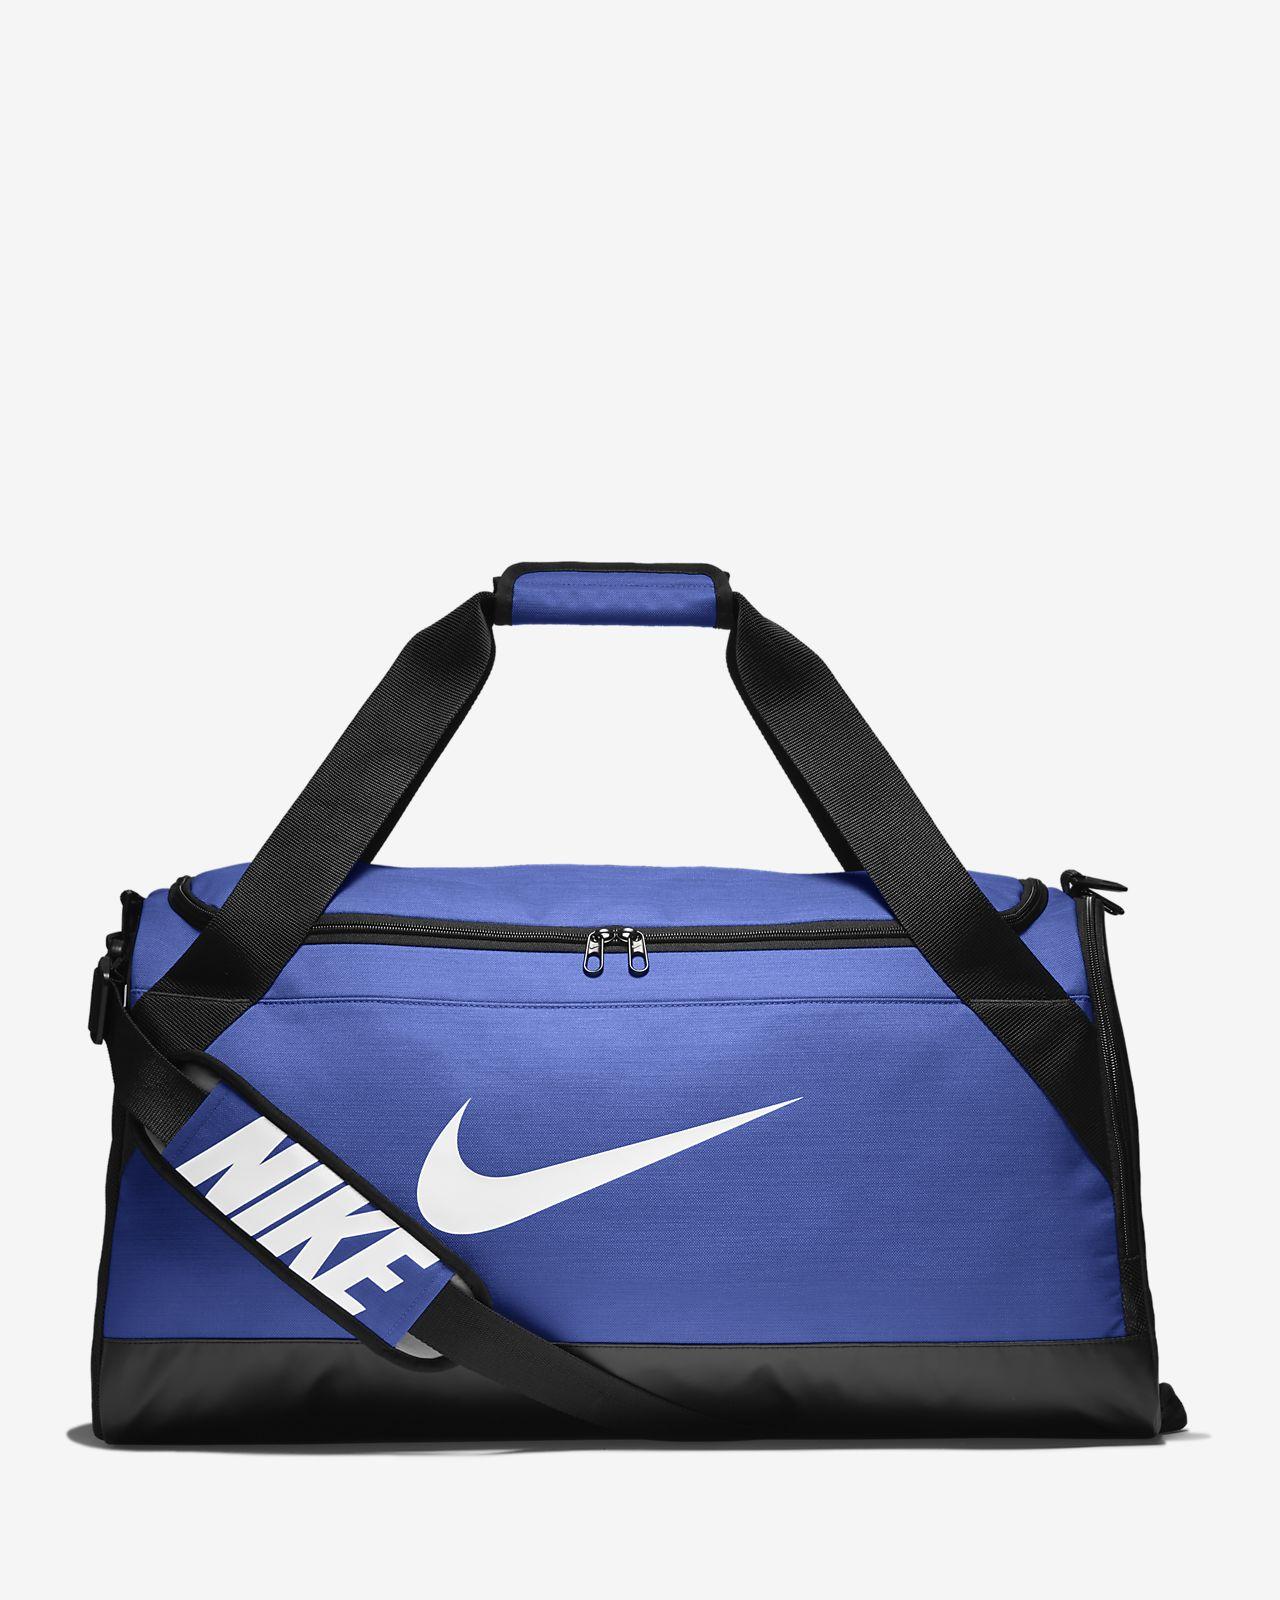 Nouveau Sac de sport de training Nike Sportswear Brasilia (taille moyenne  XY23